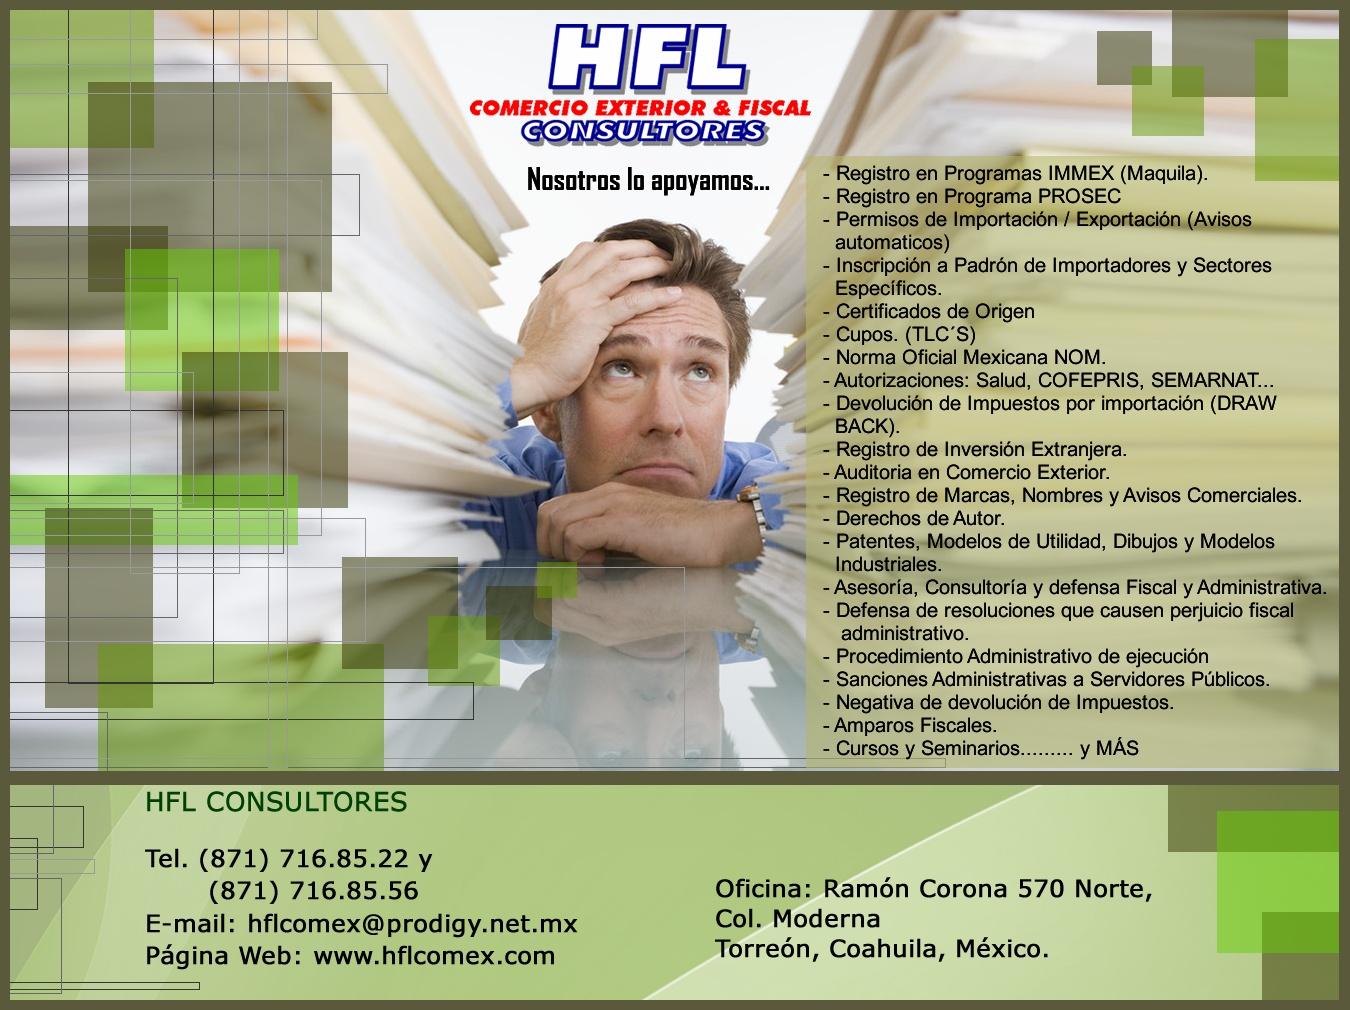 https://0201.nccdn.net/4_2/000/000/057/fca/Publicidad-Servicios.3-1350x1010.jpg